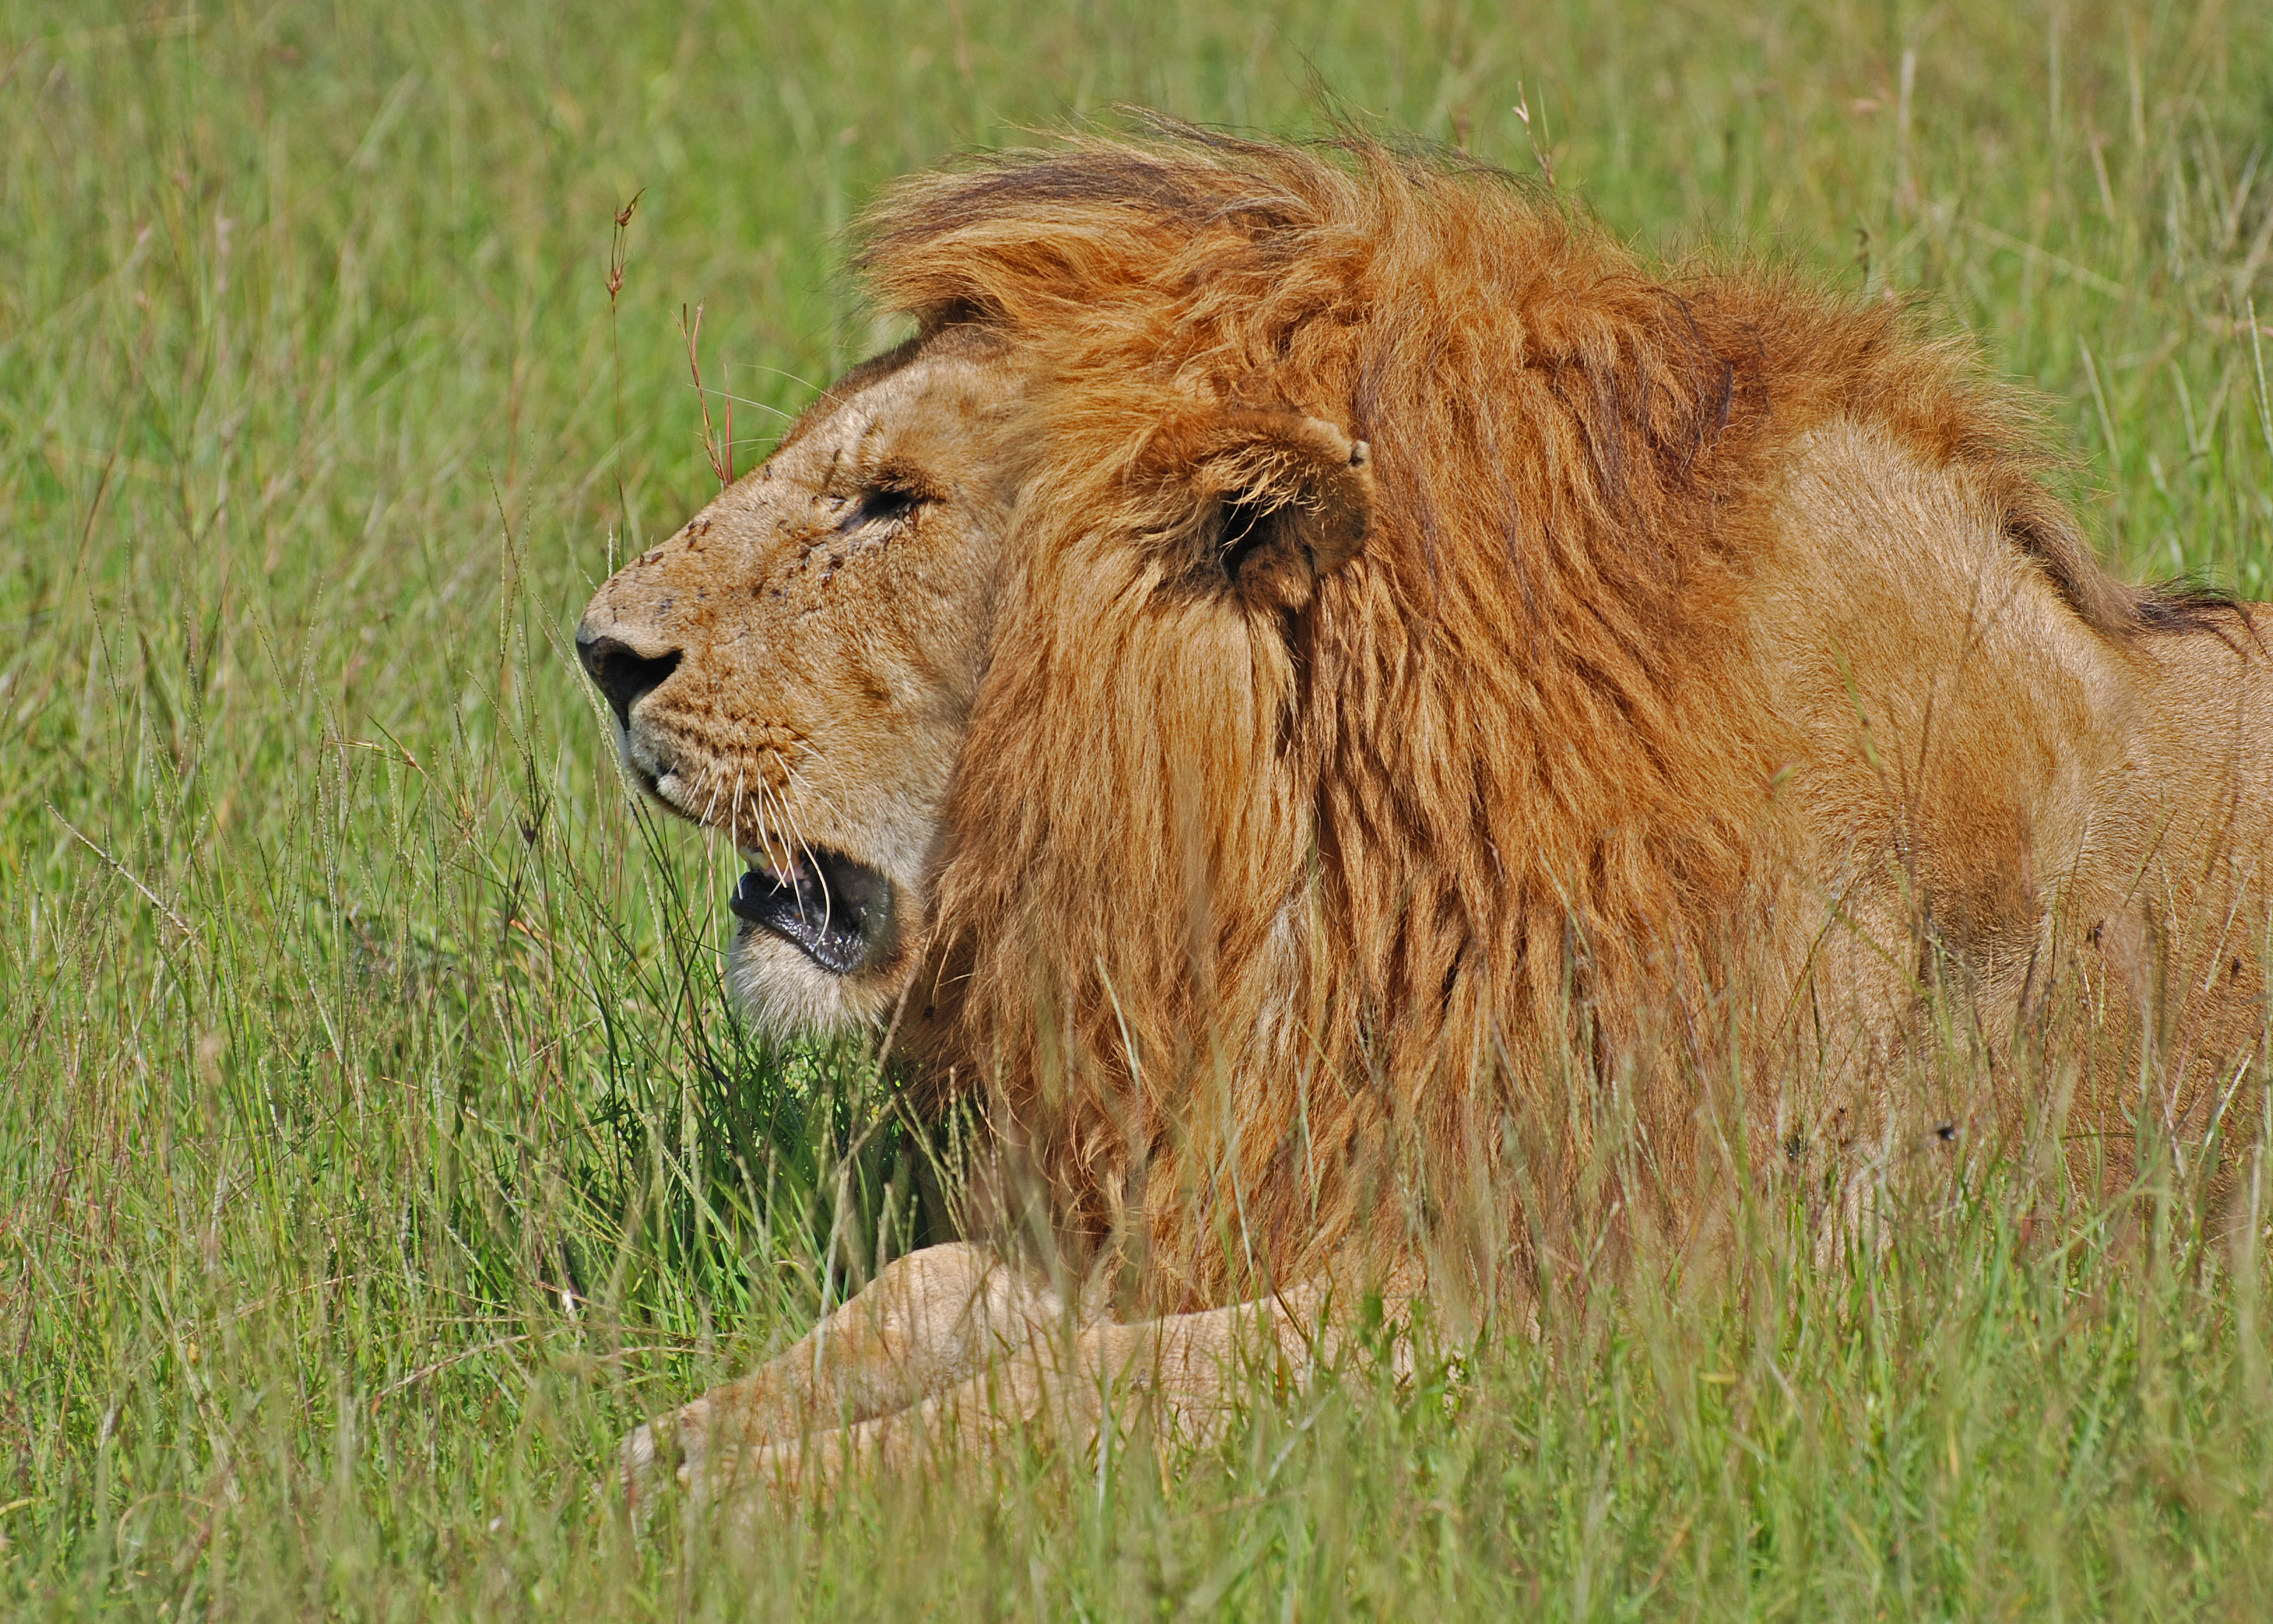 kenya lions File Lion  Masai Mara  Kenya jpg - Wikipedia